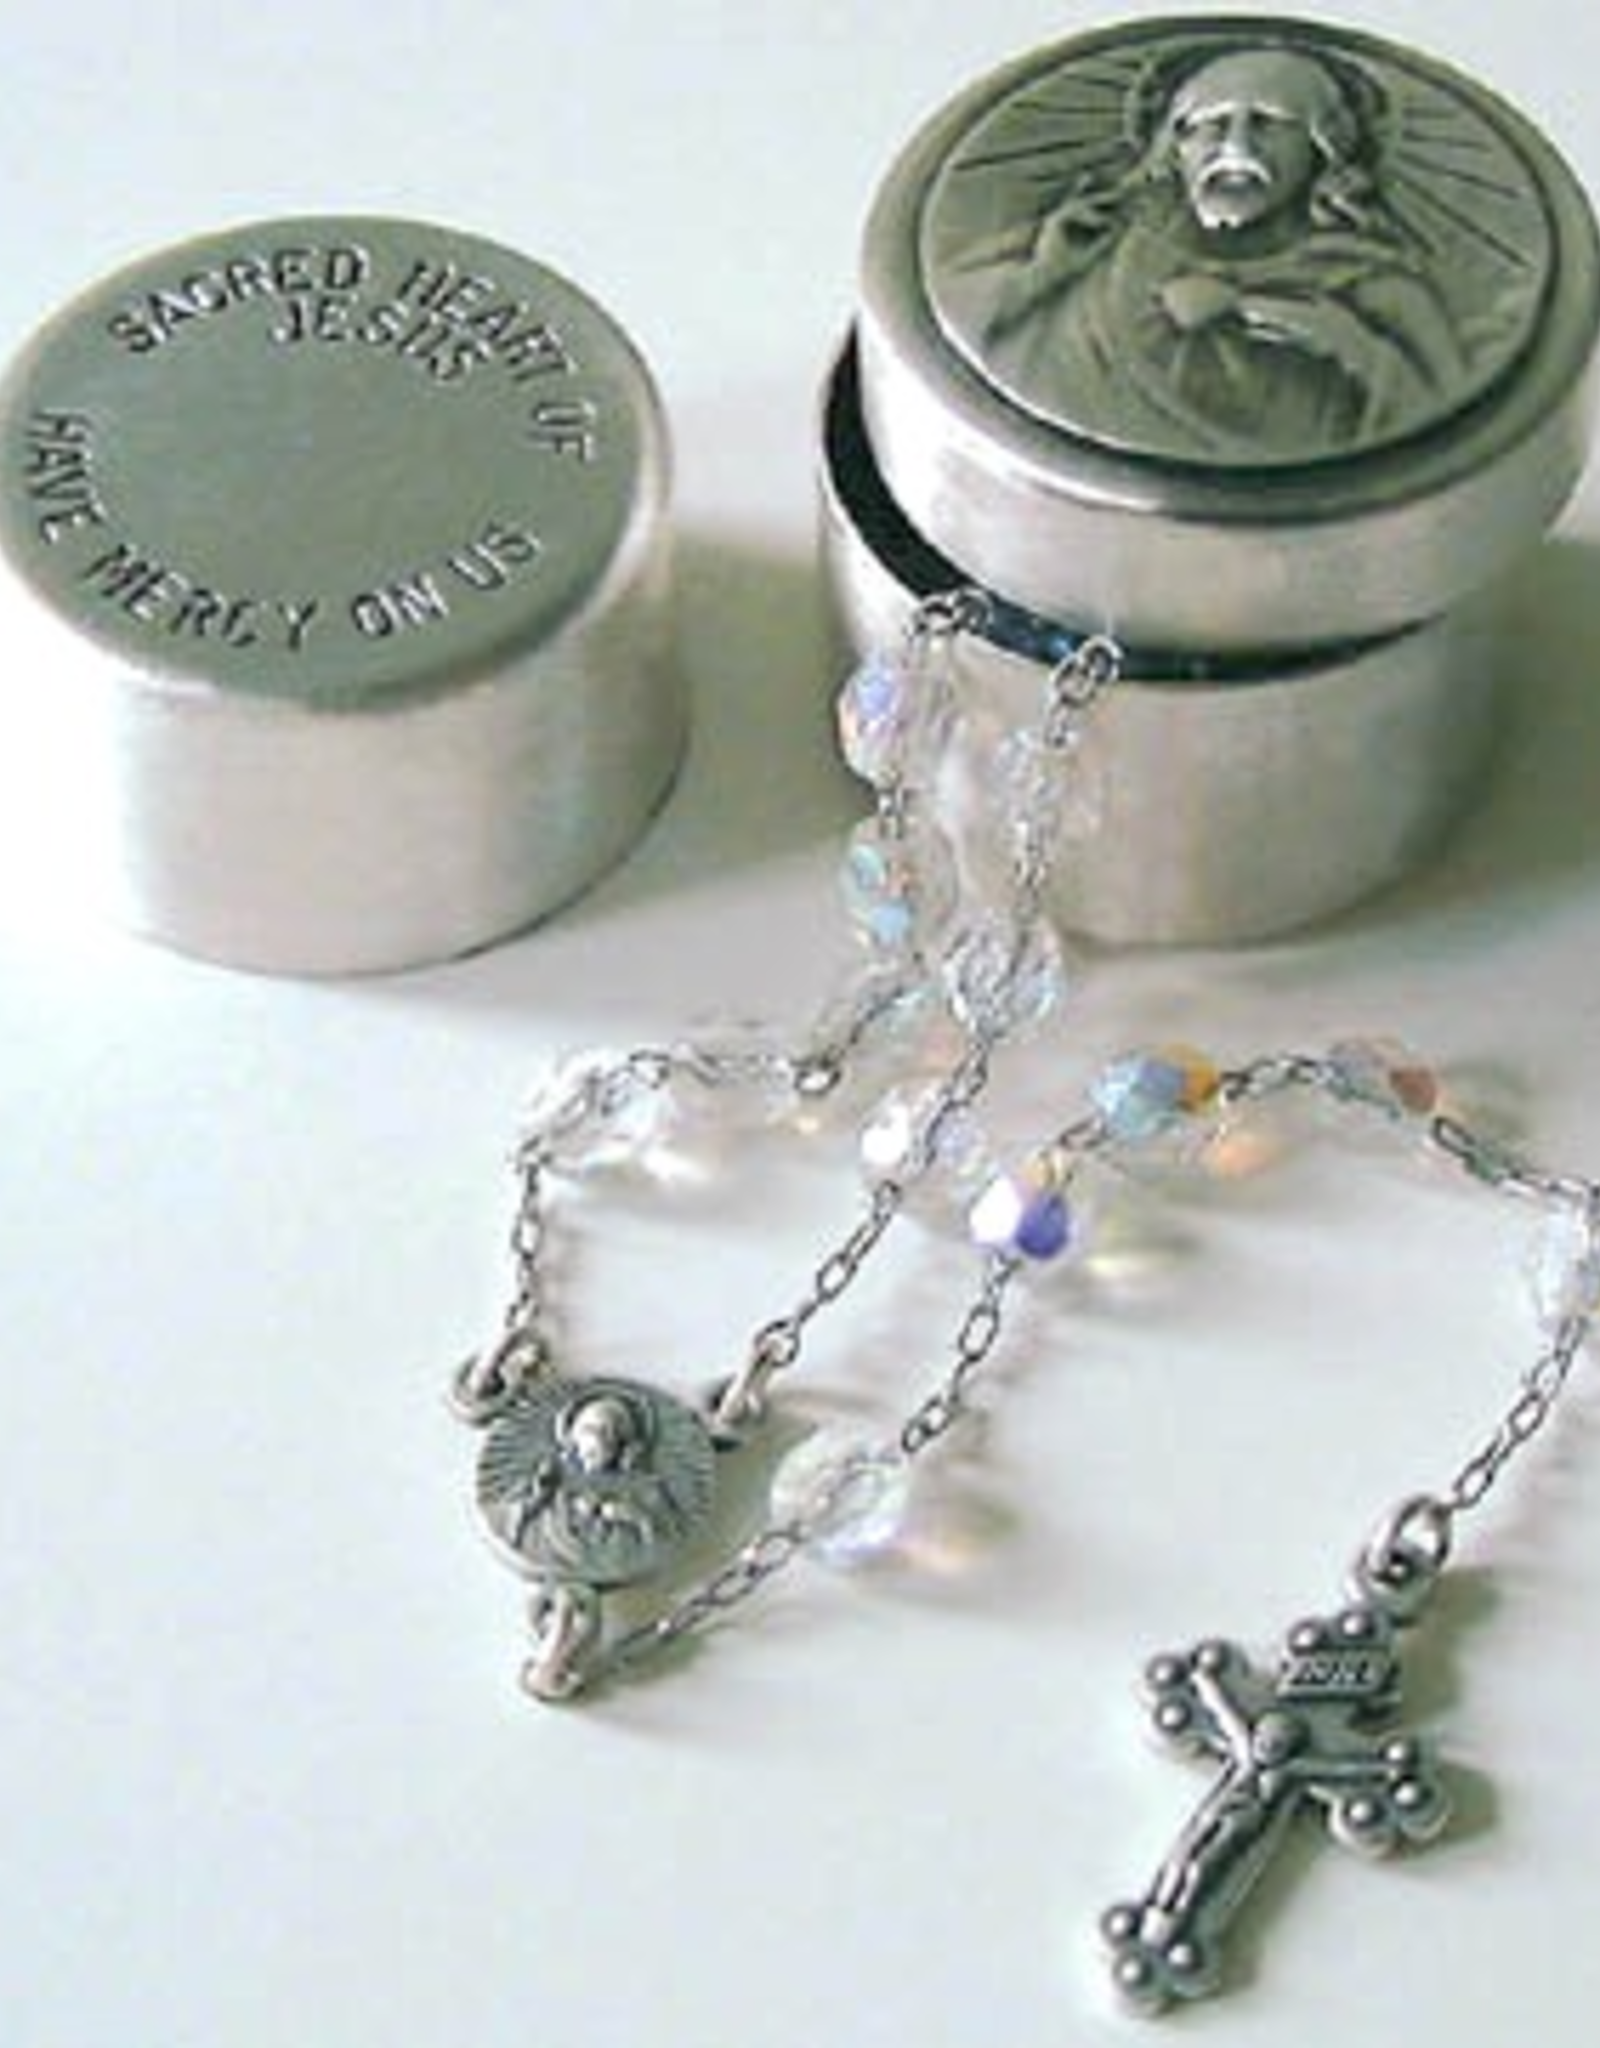 Illumigifts St. Michael Rosary Box